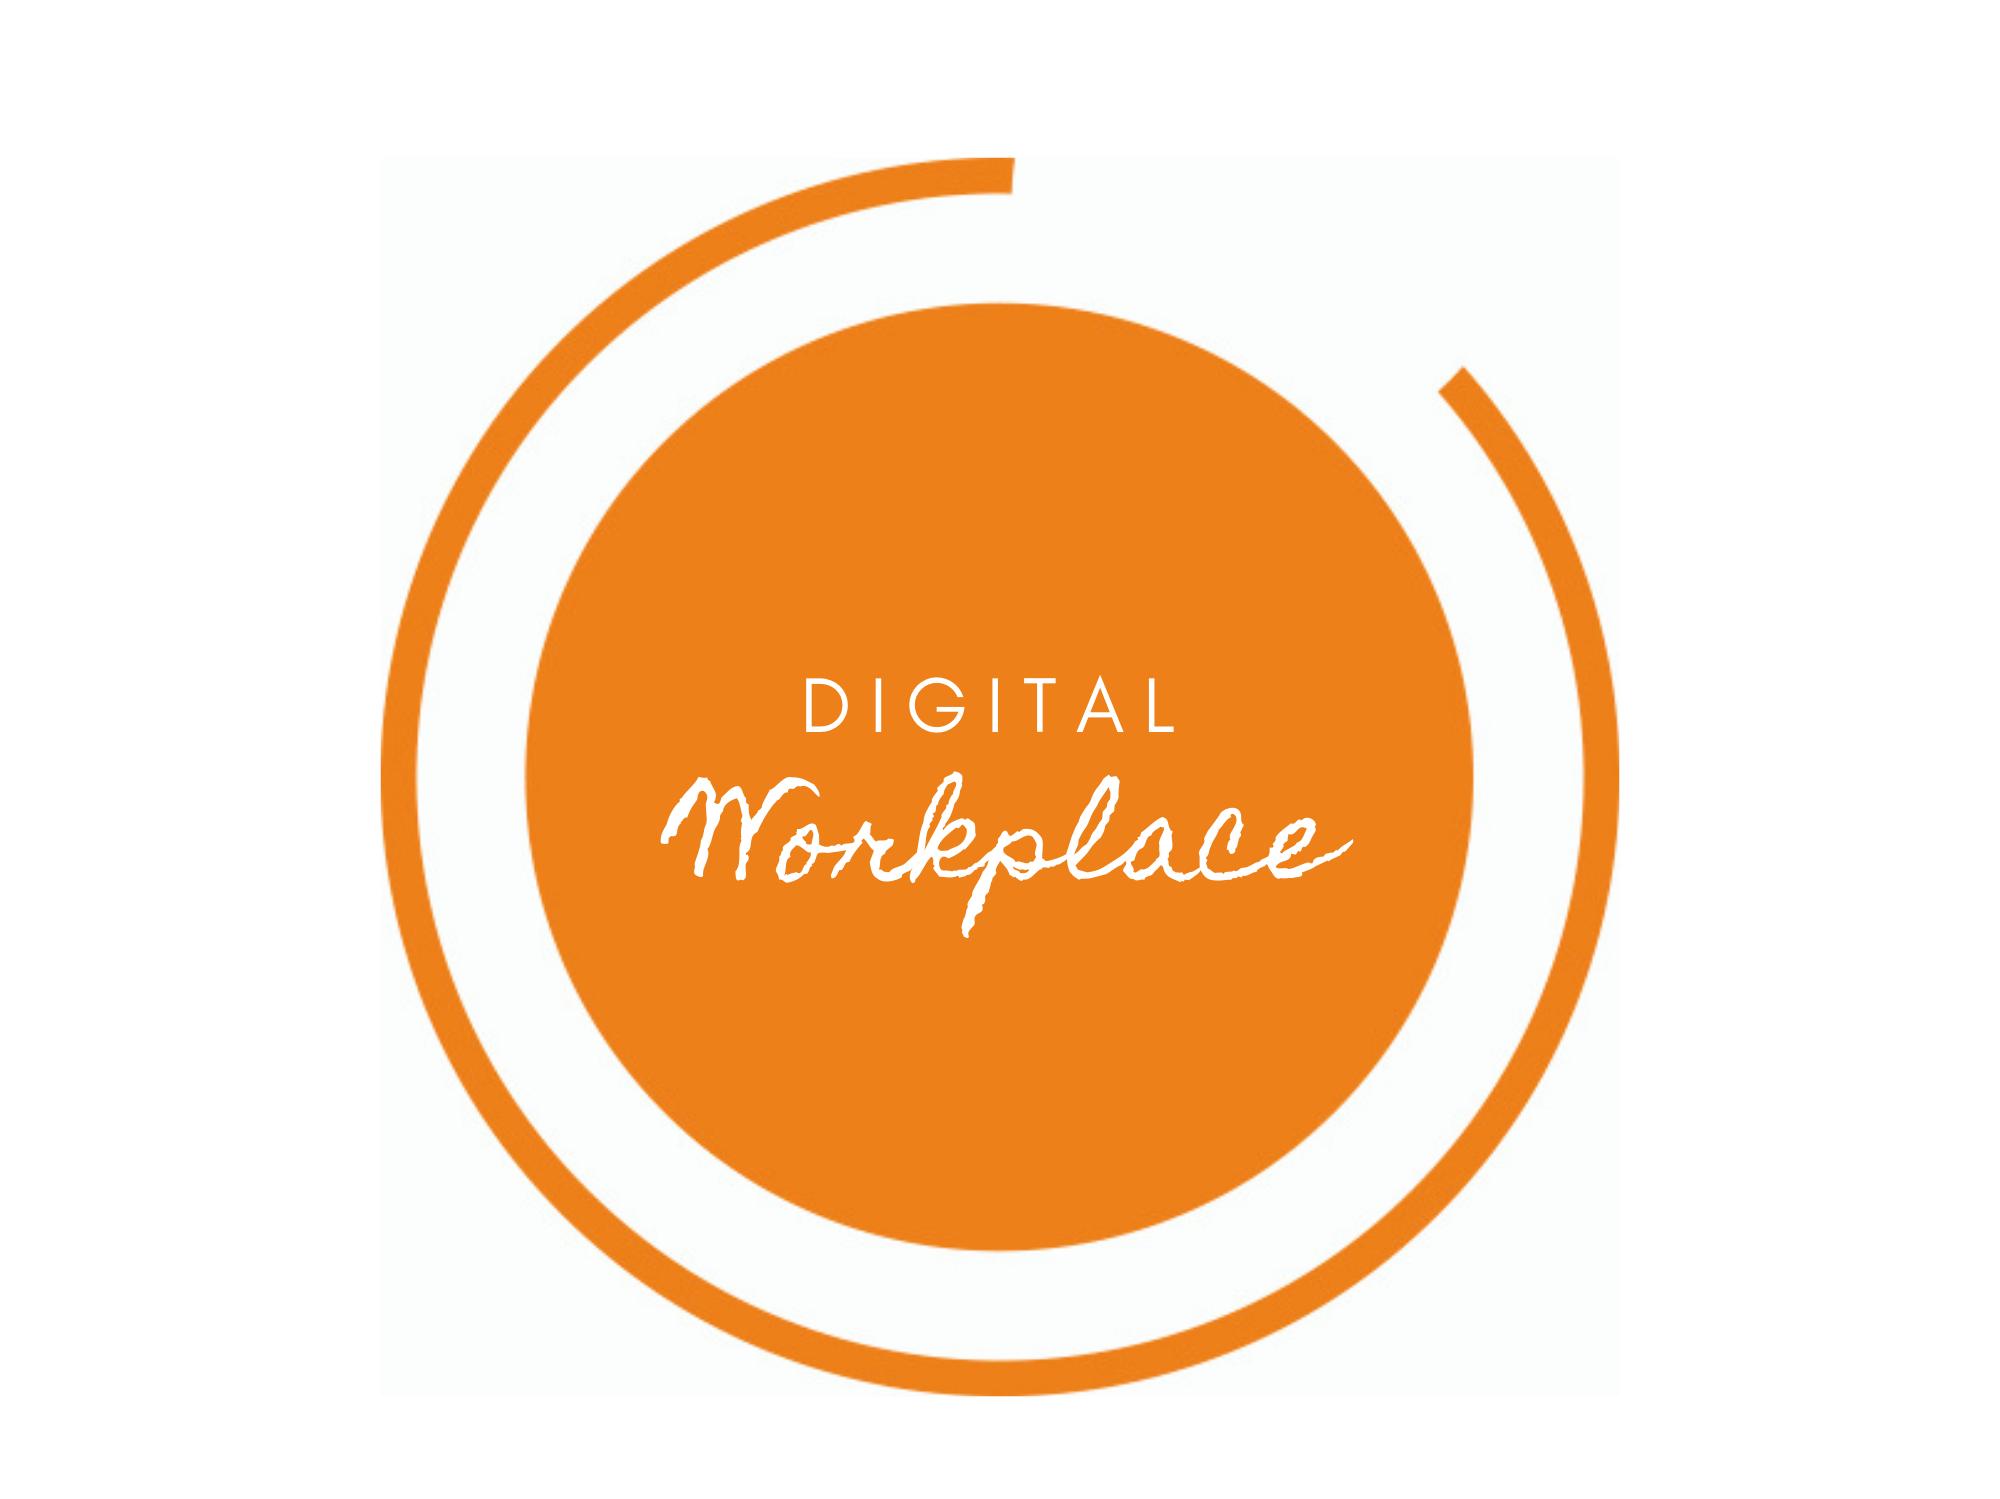 Nexplore Bern Digital Workplace Microsoft Partner